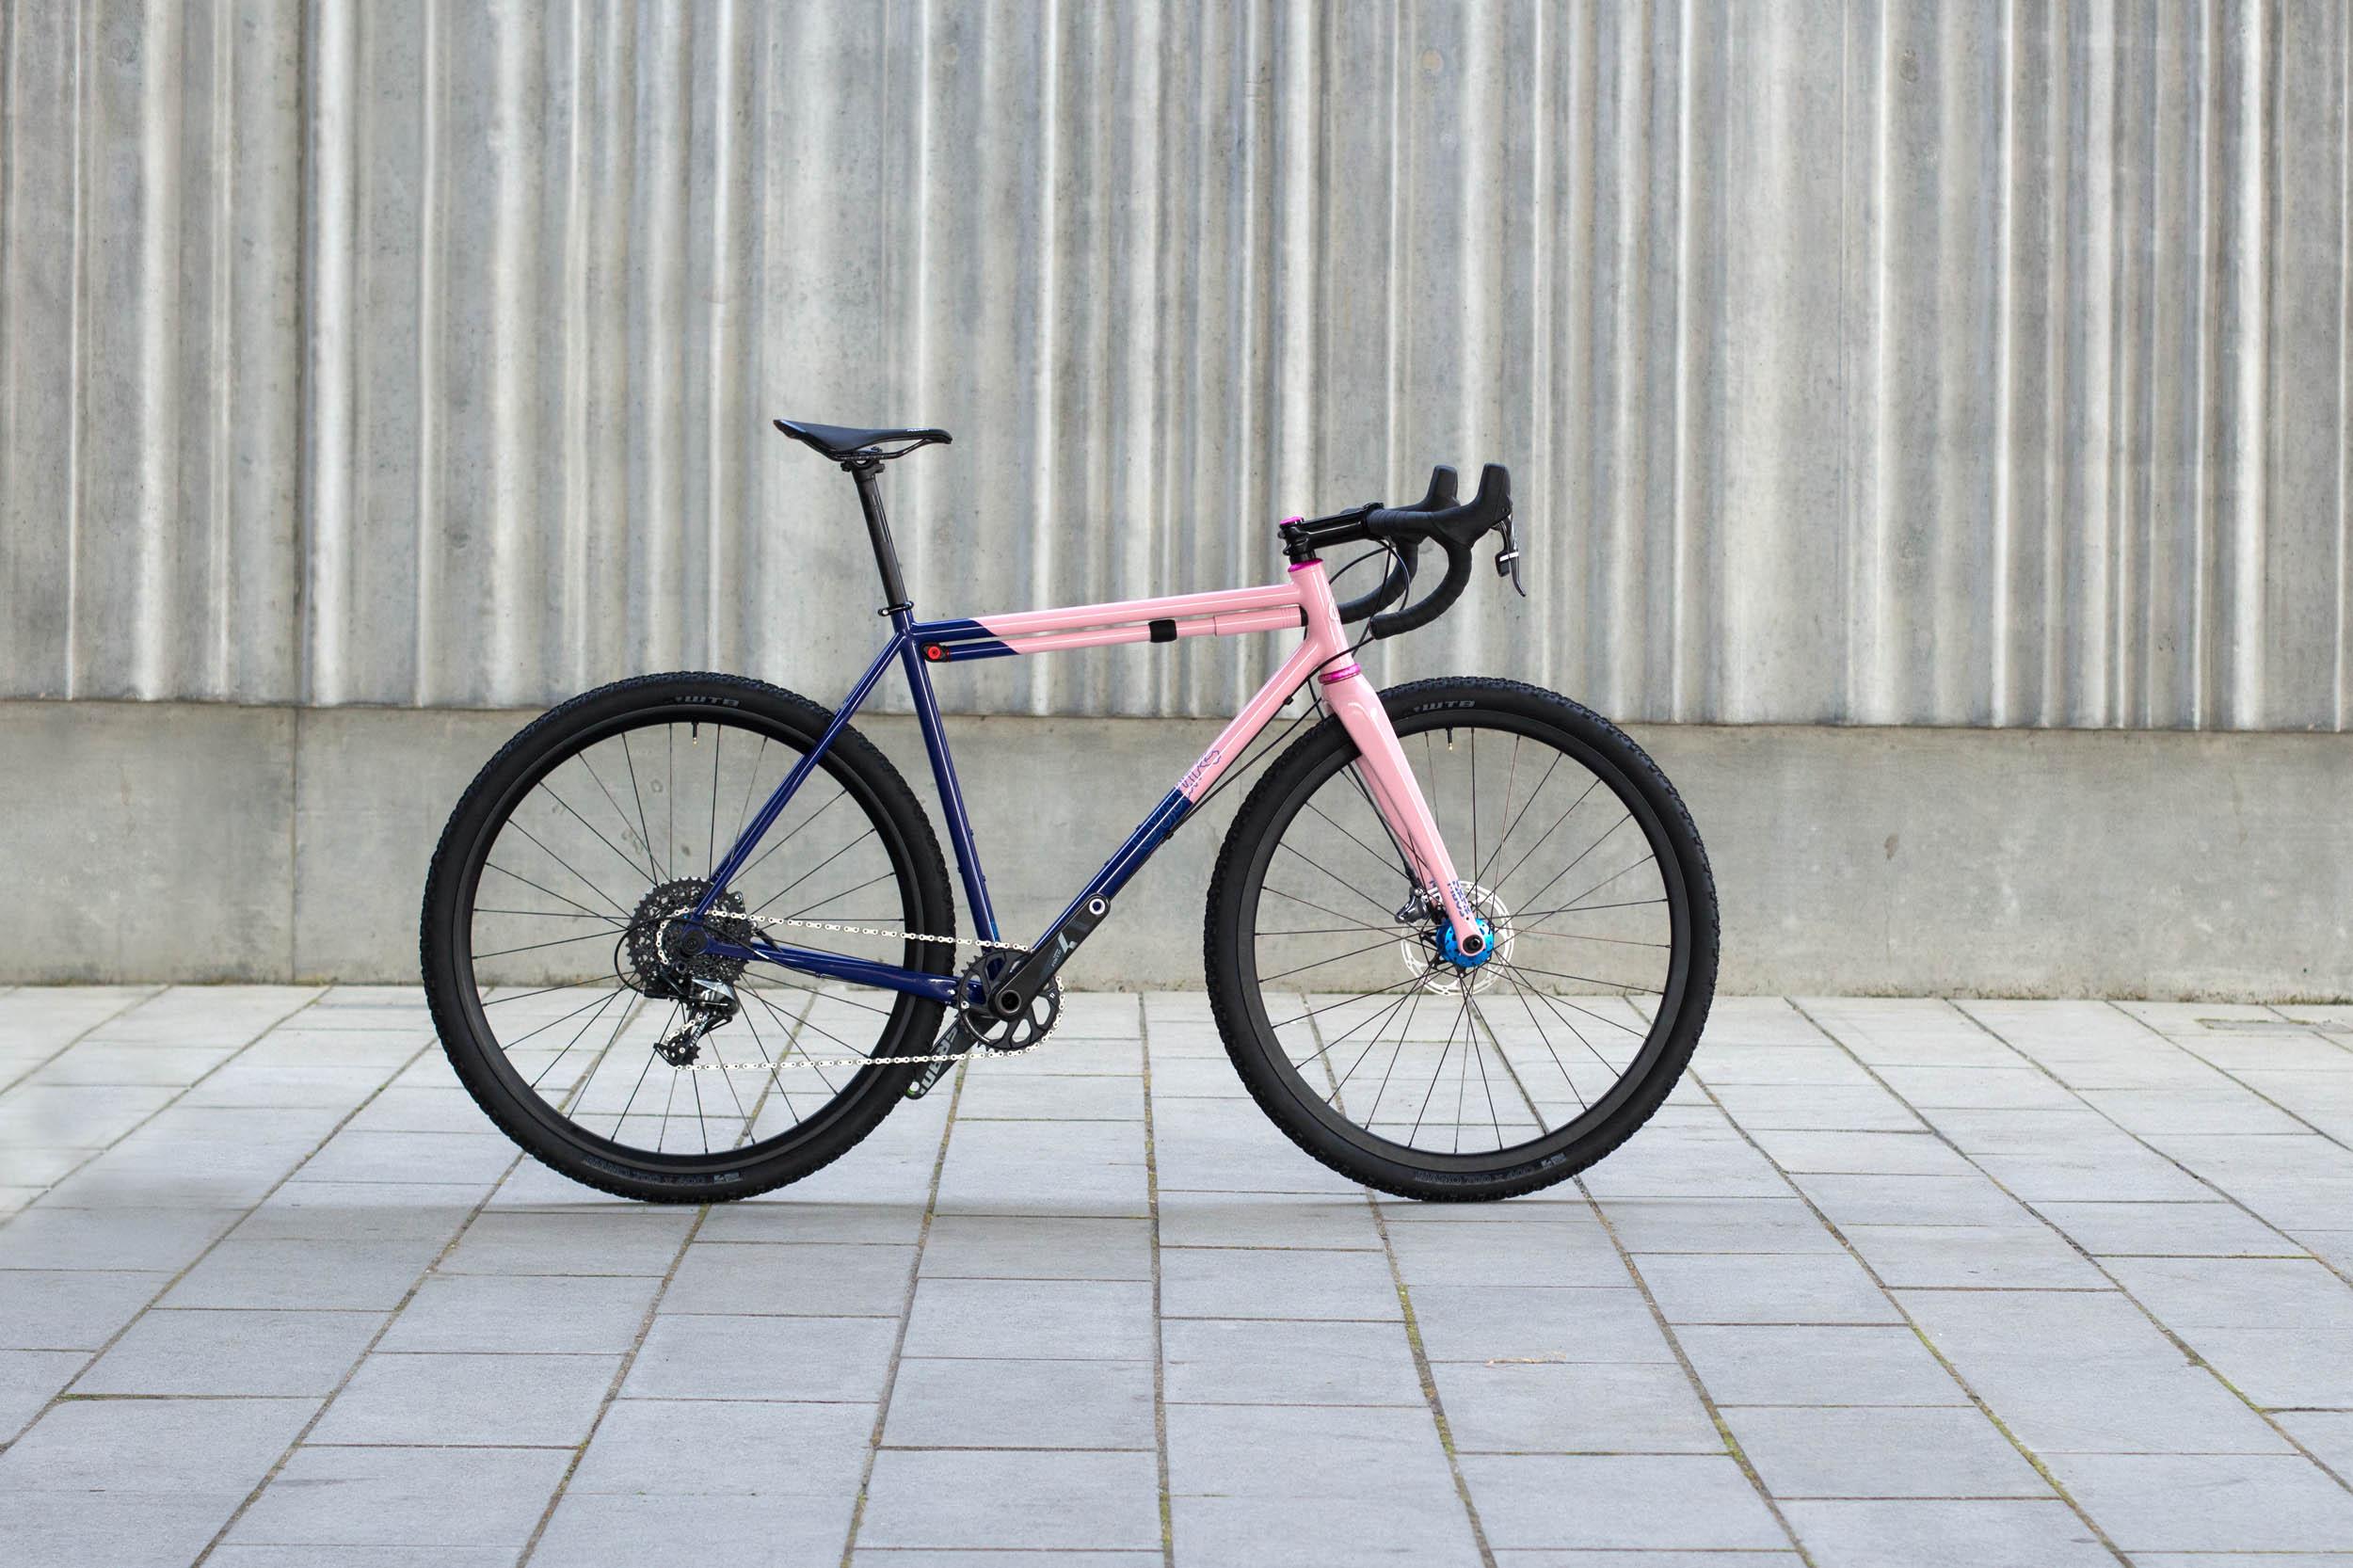 quirk_cycles_peter_lunt_kegety_02.jpg